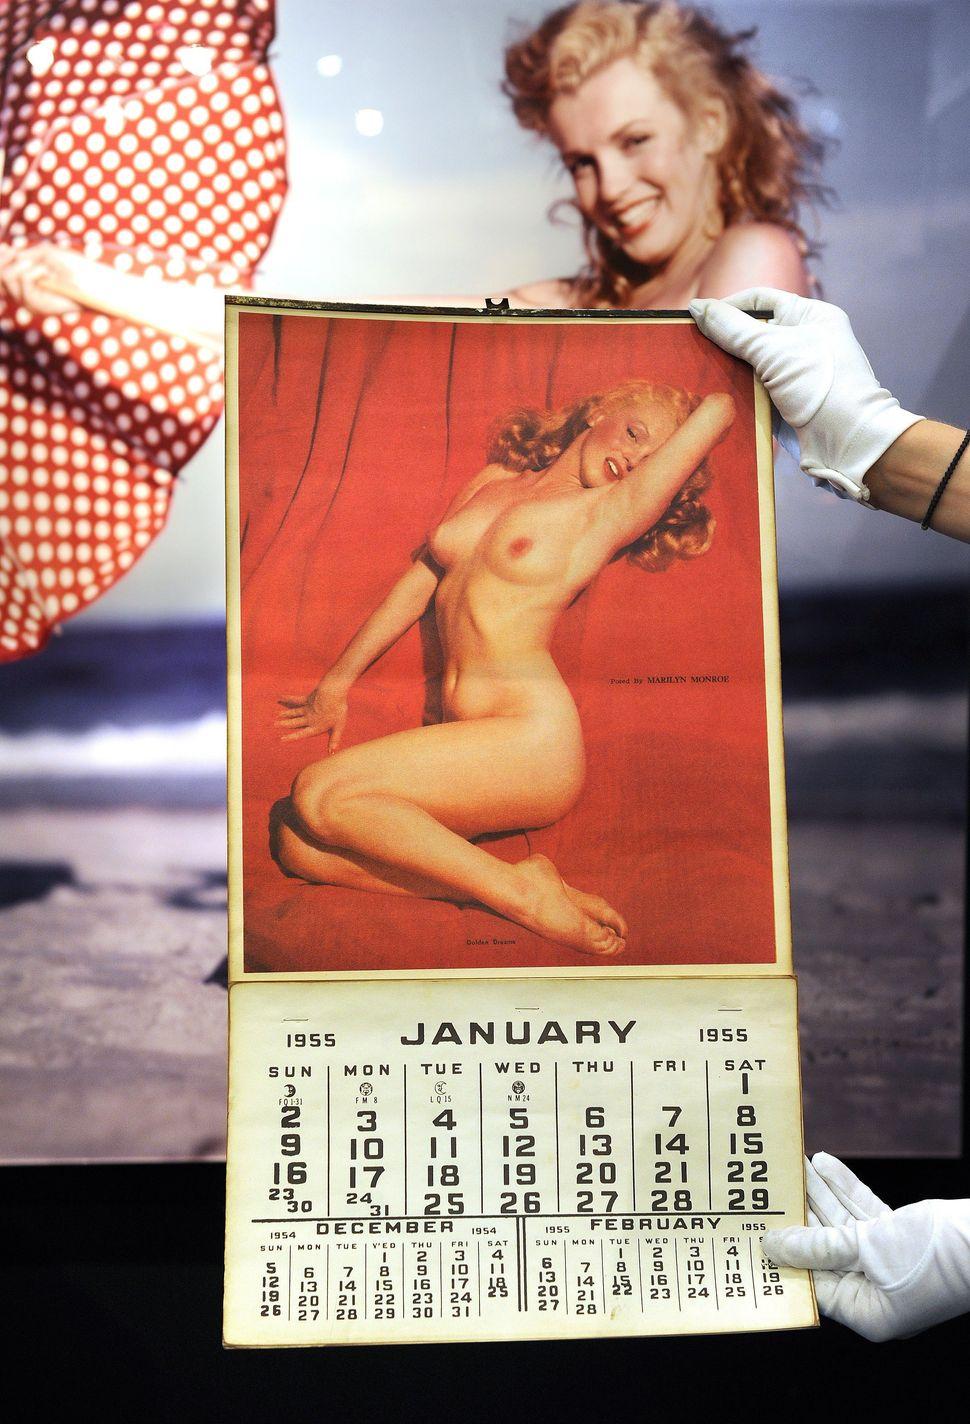 A Marilyn Monroe 1955 calendar.